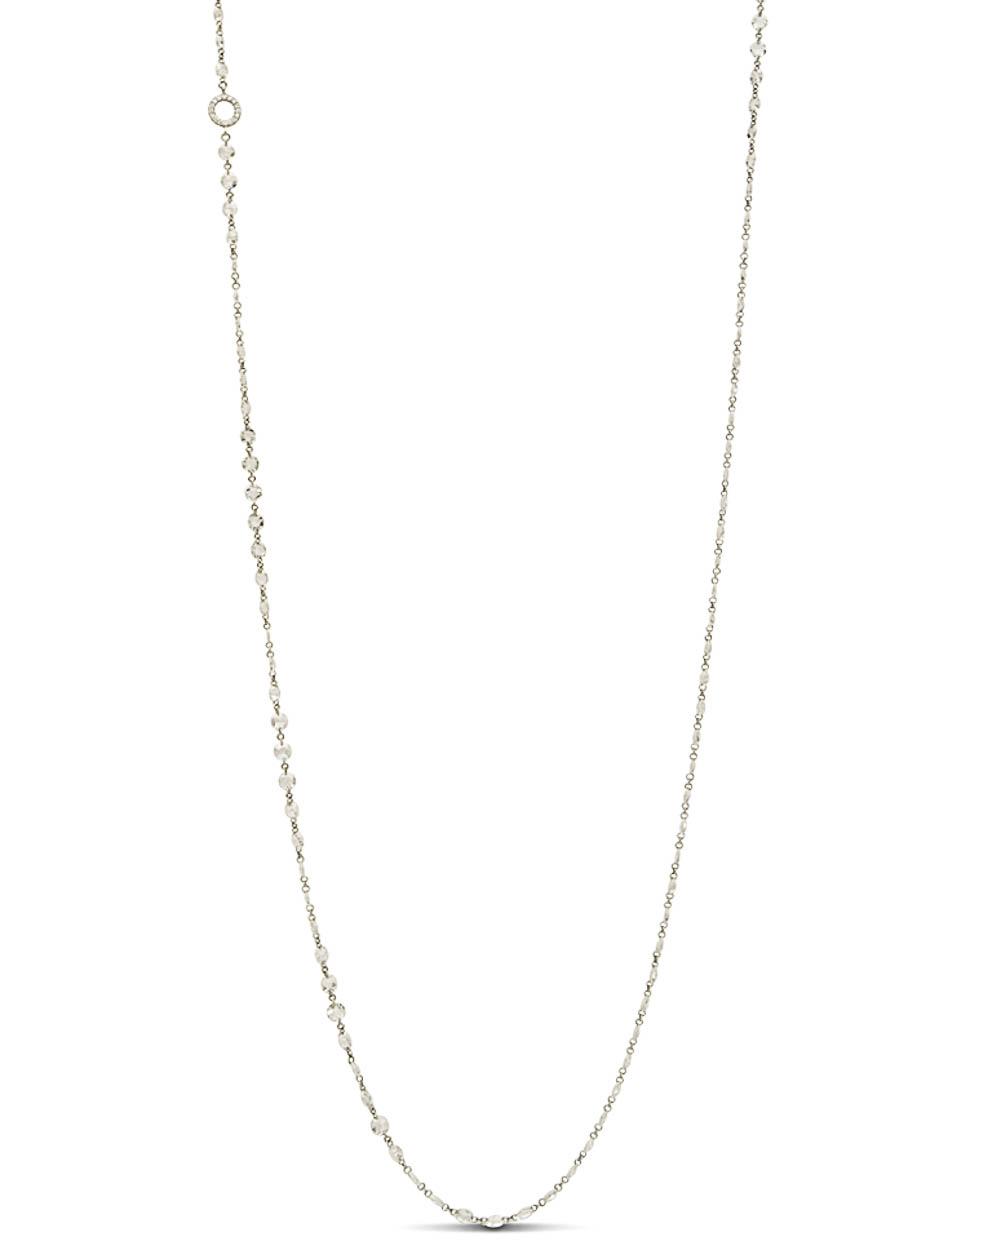 White Gold Medium Diamond Chain Necklace Regarding Most Popular Medium Diamond Necklaces (View 22 of 25)